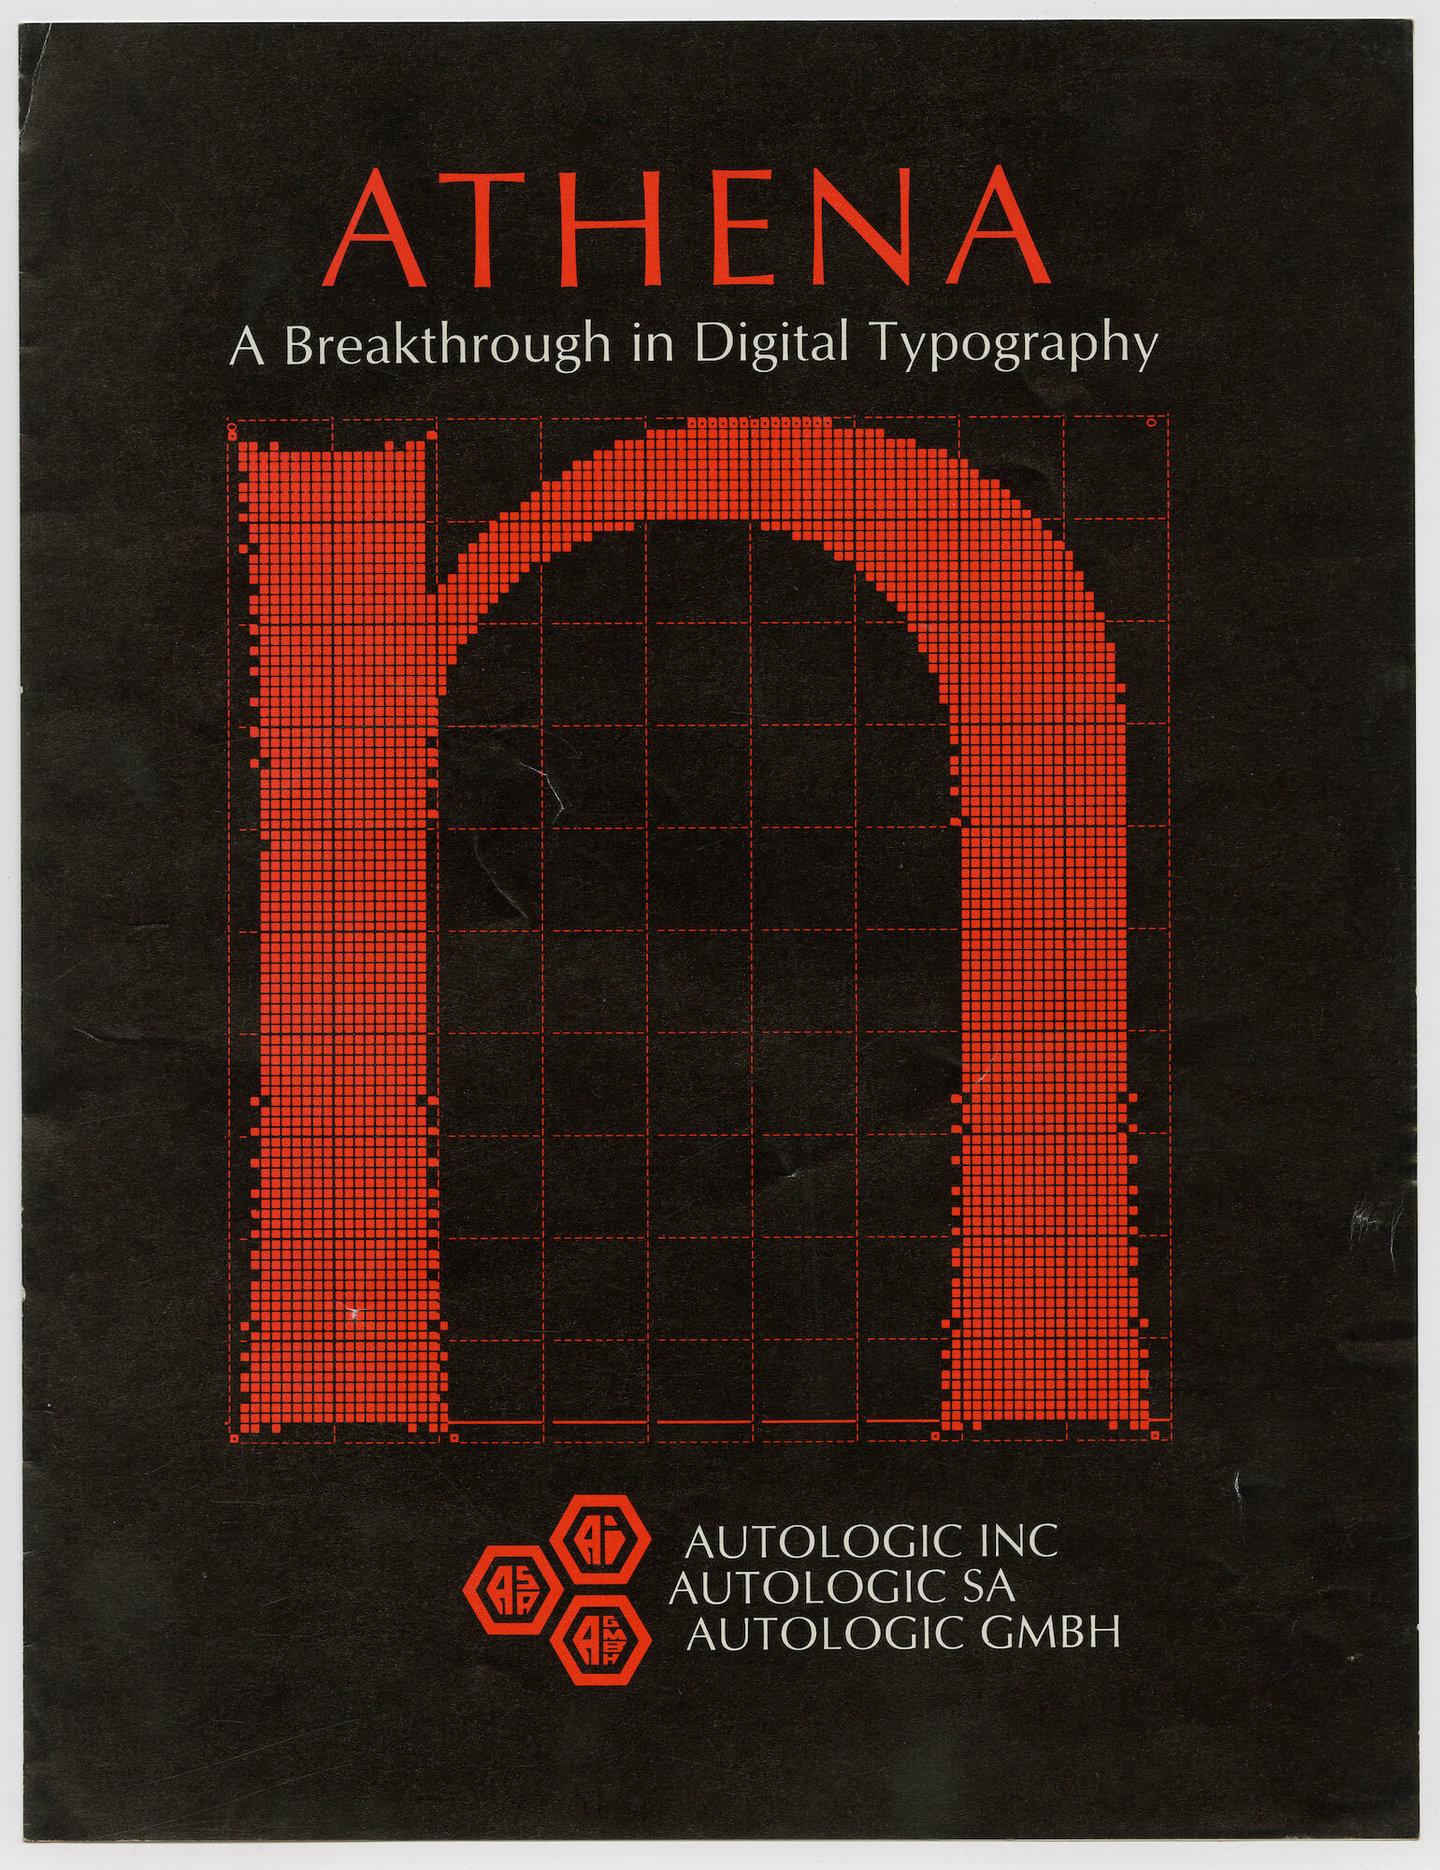 Letterproef met het digitale lettertype Athena van Autologic